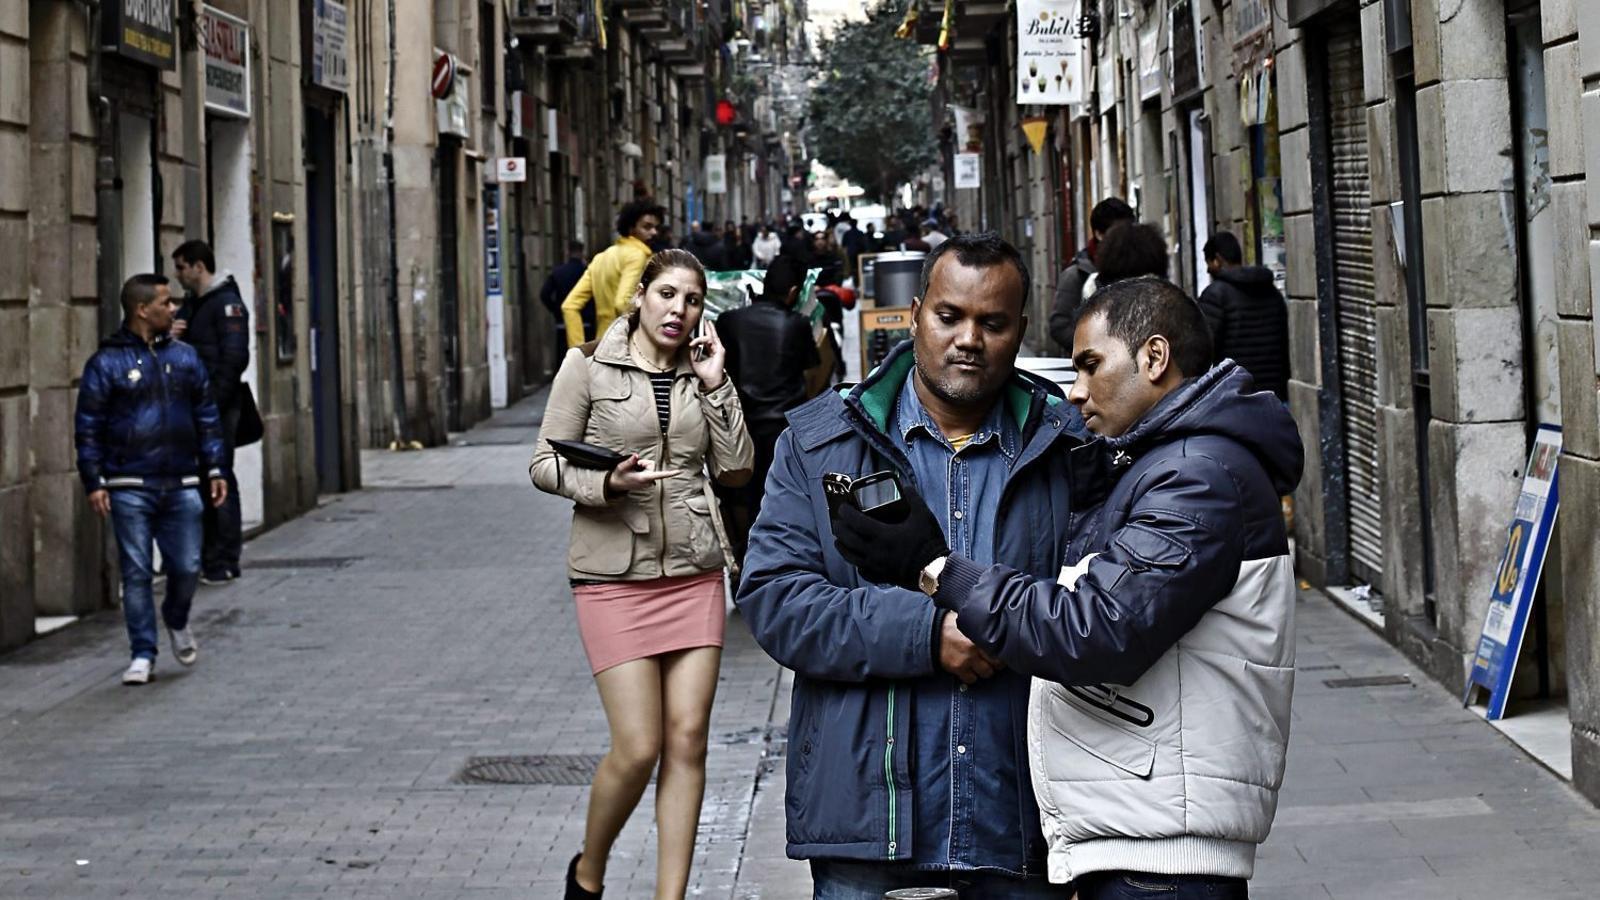 SOS Racisme alerta que augmenten els casos de racisme entre particulars